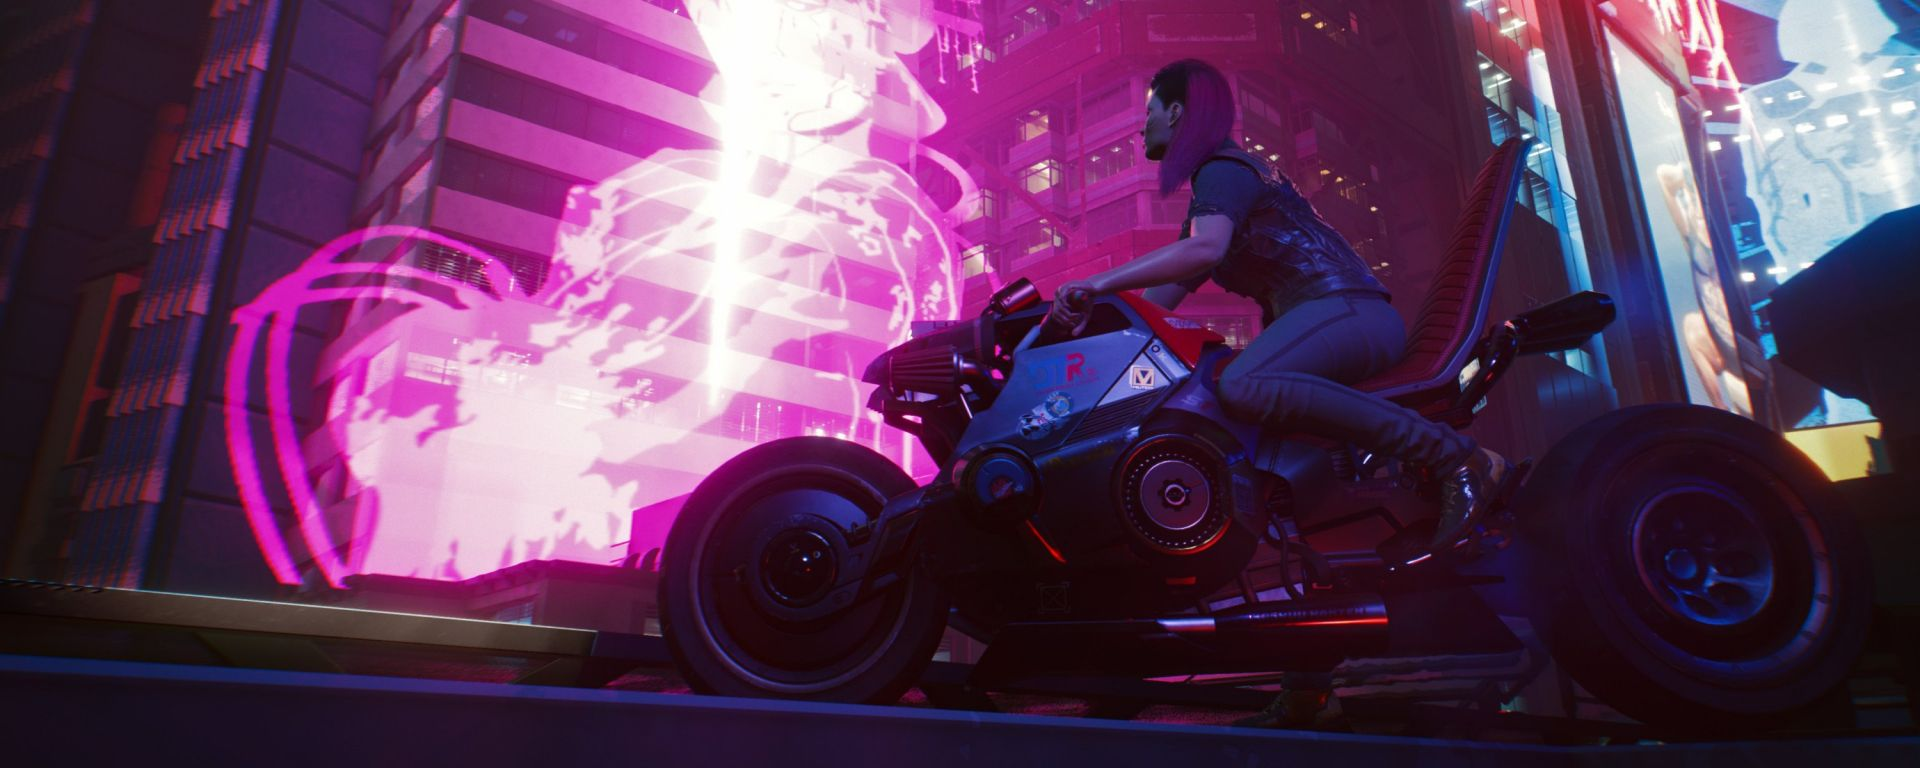 Cyberpunk 2077: le moto di Keanu Reeves nel gioco